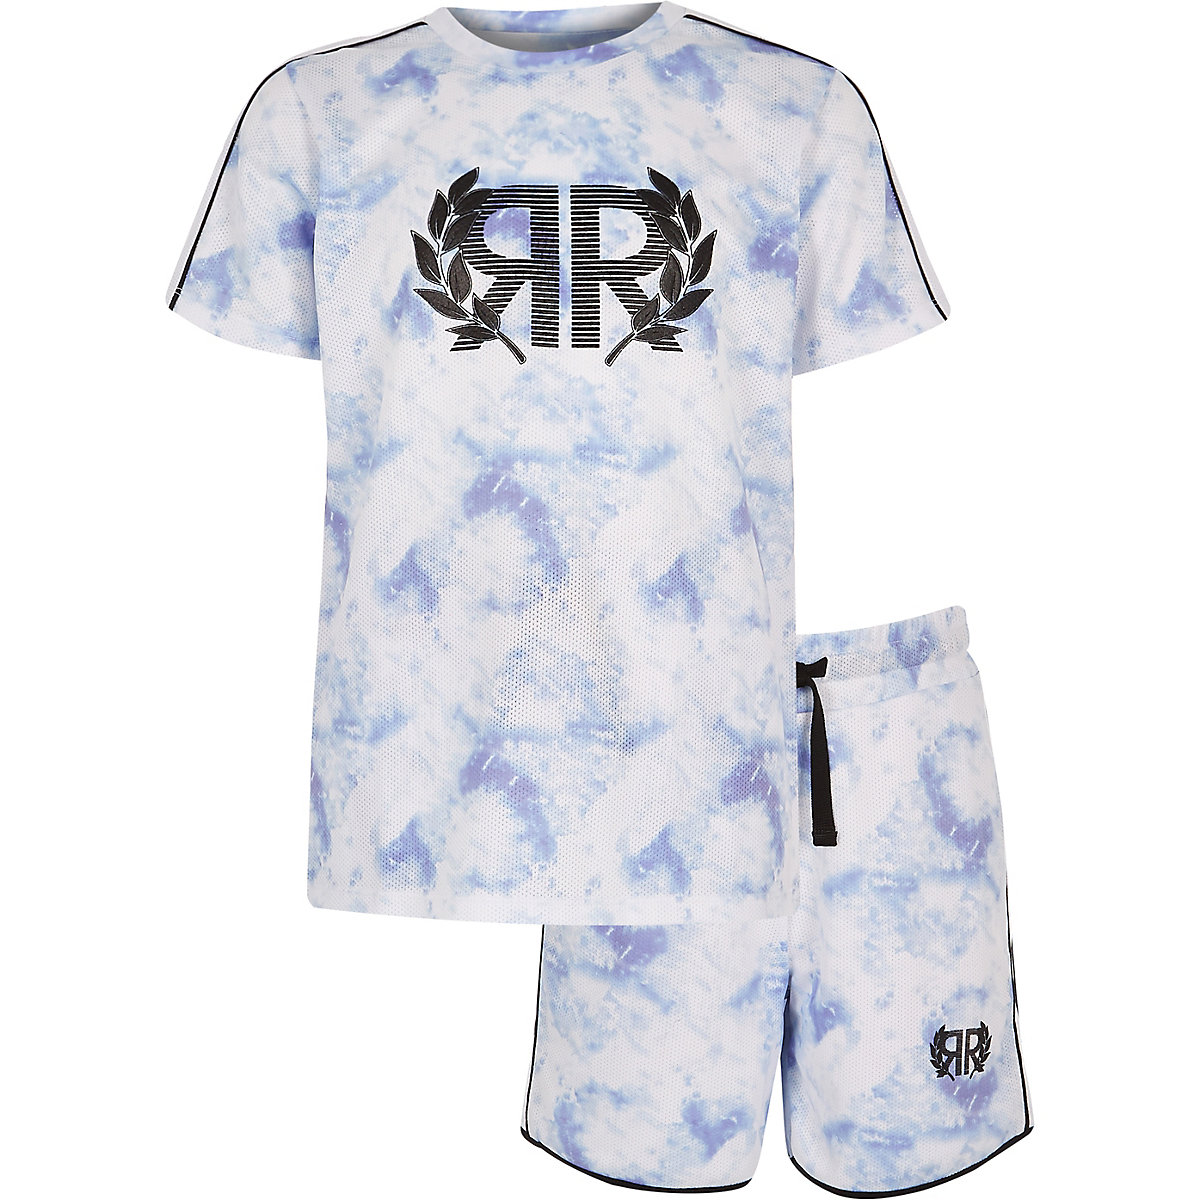 Boys blue mesh T-shirt outfit